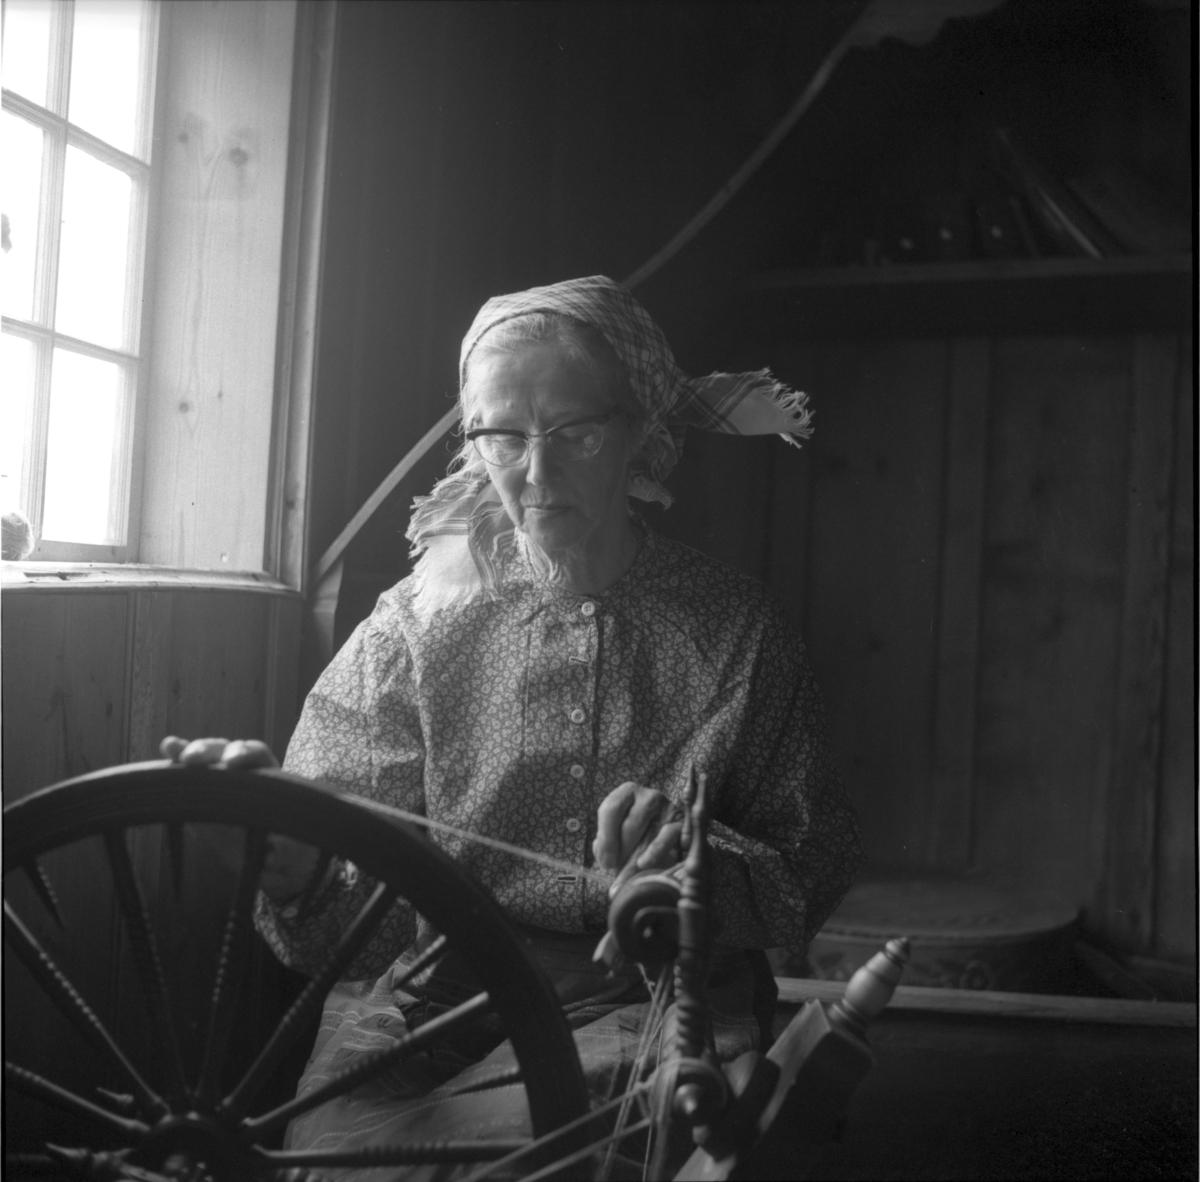 Petrine Løvåsen